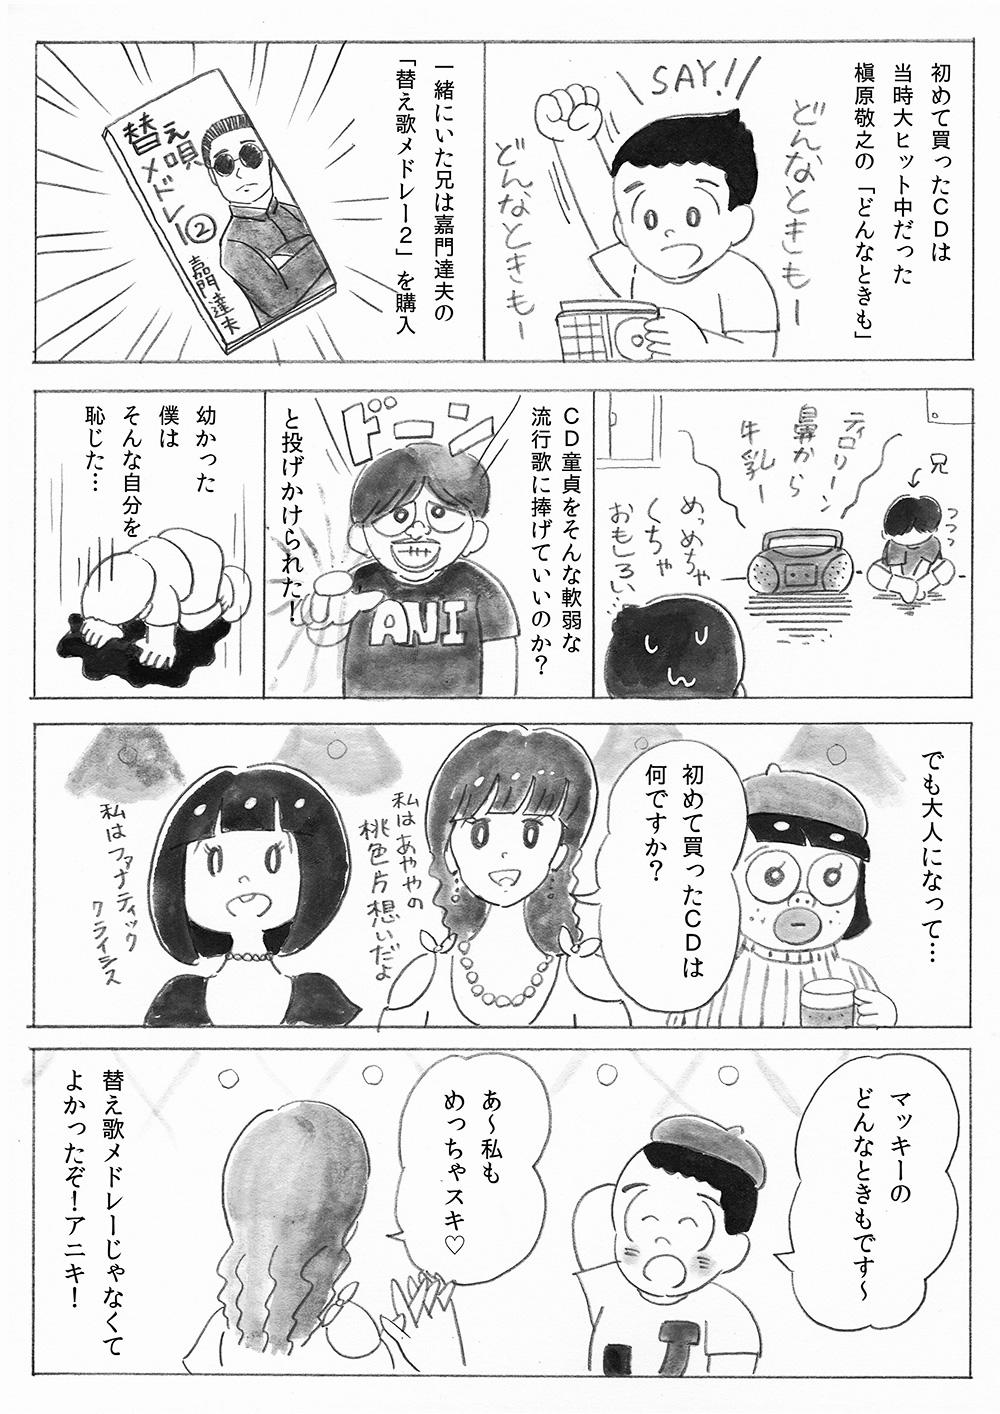 jimbo_satoshi_meetia01